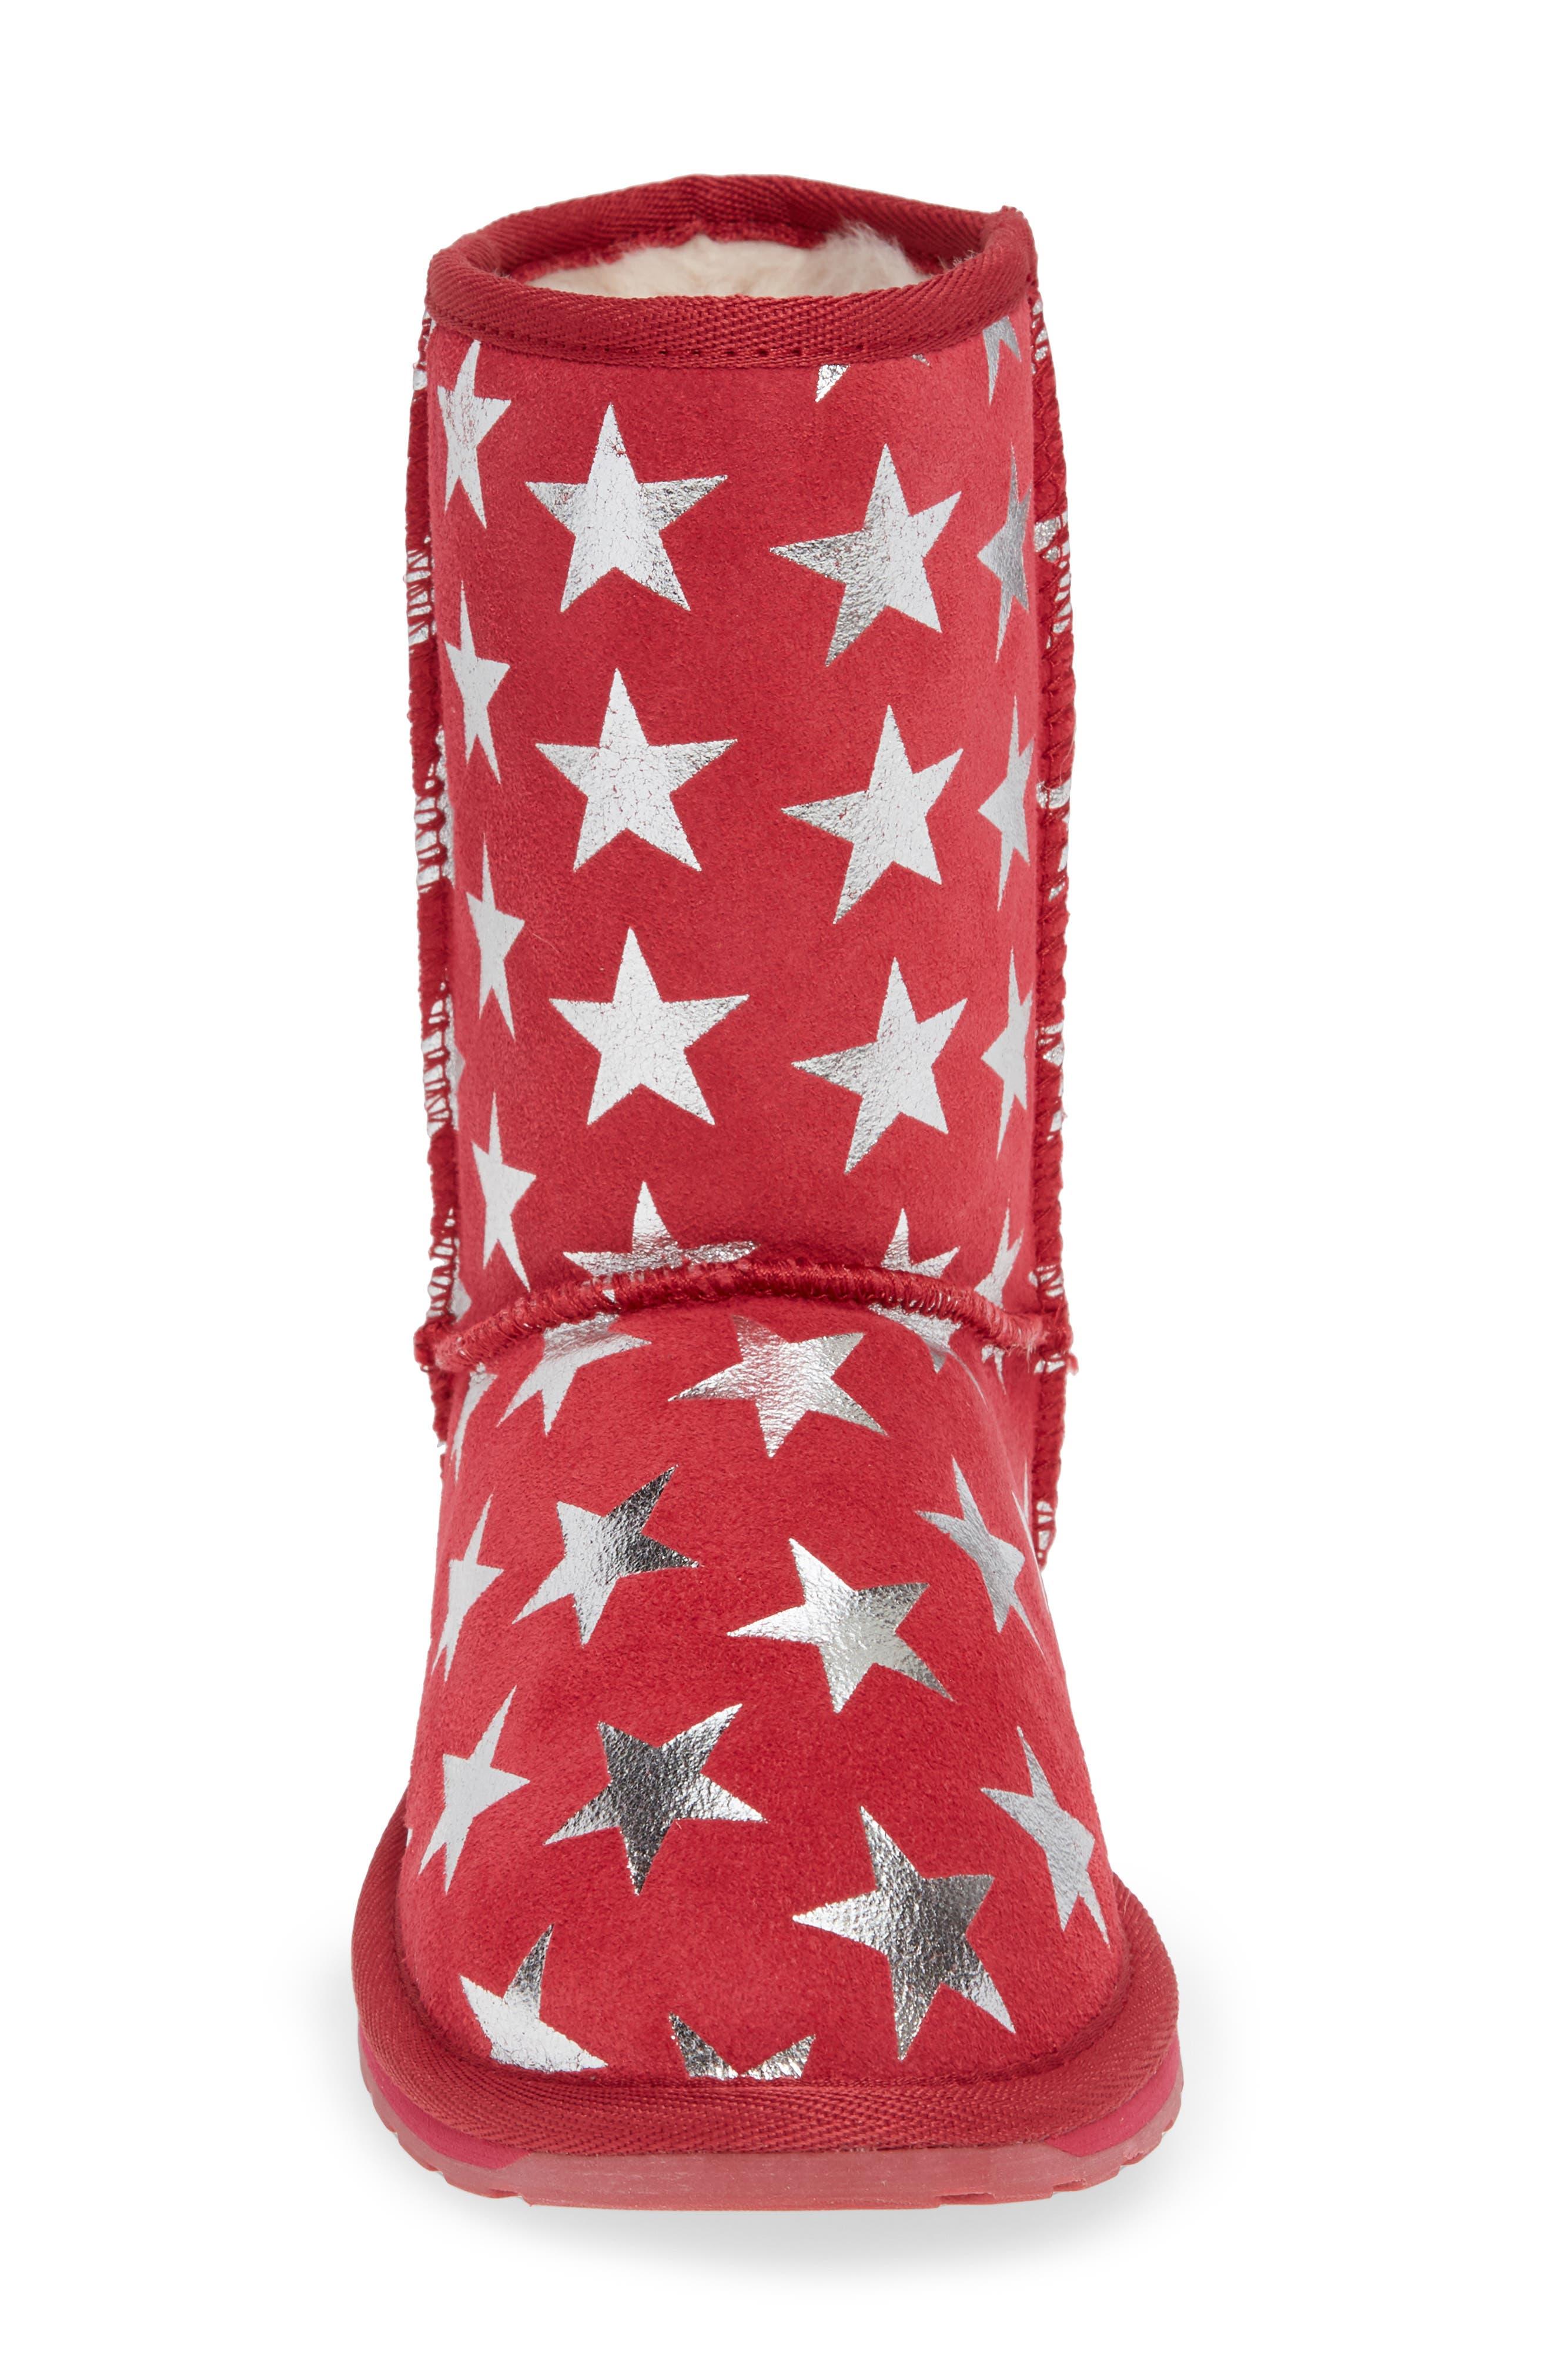 EMUAustralia Starry Night Boot,                             Alternate thumbnail 6, color,                             Fuchsia